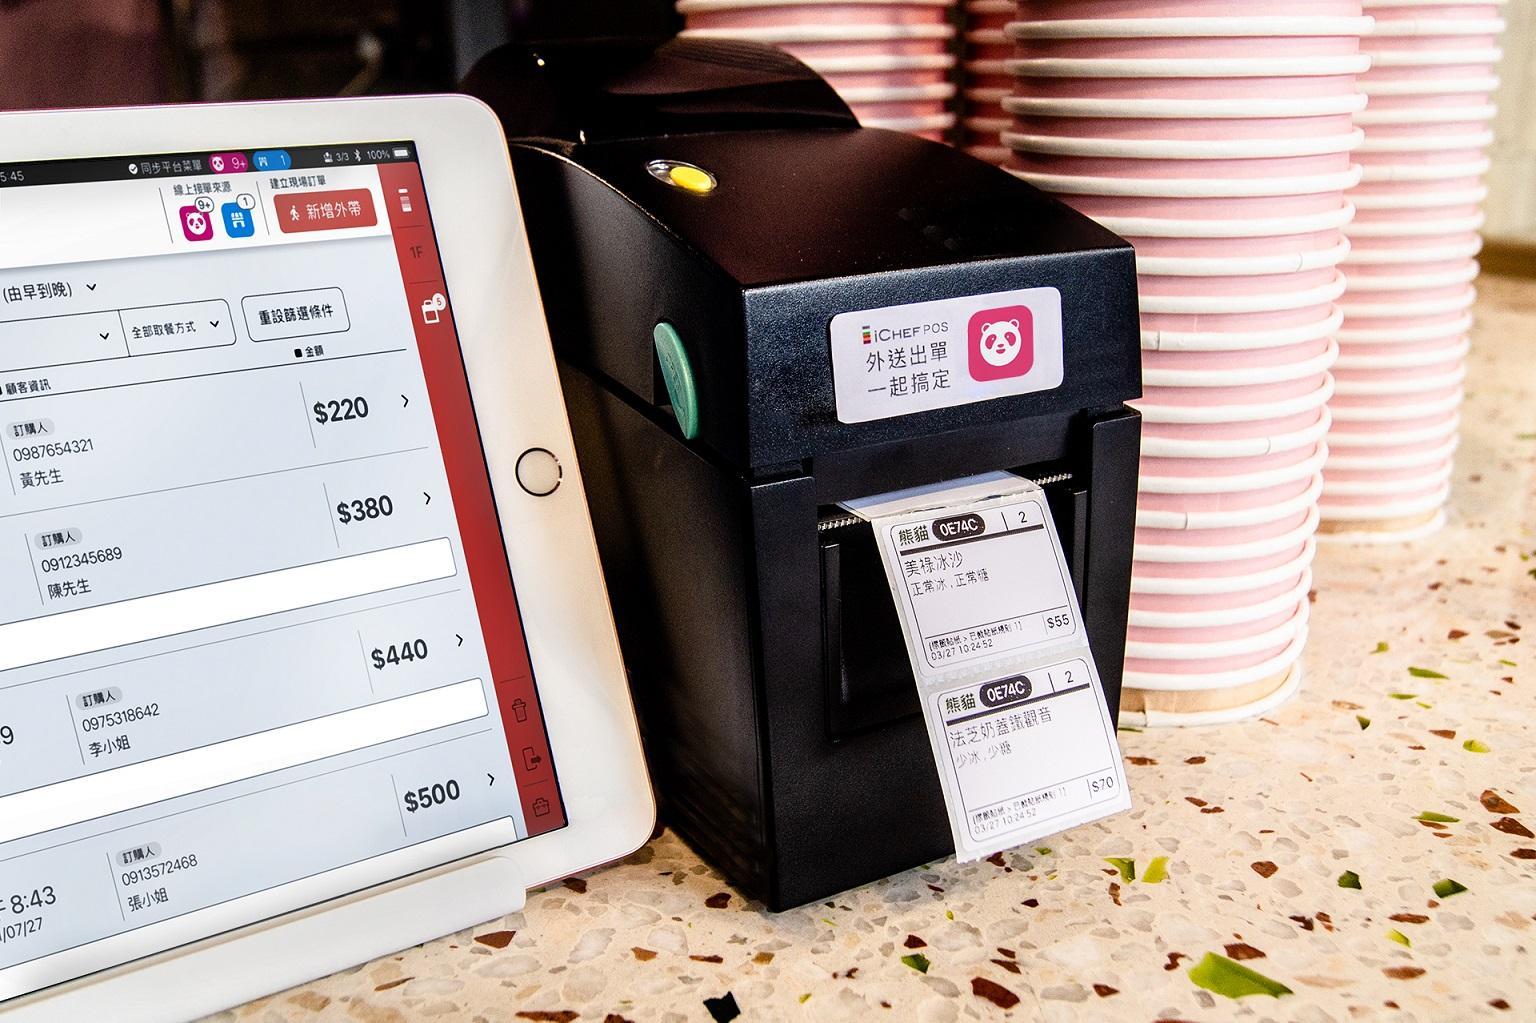 iCHEF整合foodpanda外賣系統 平台增星馬台近9,000間餐廳